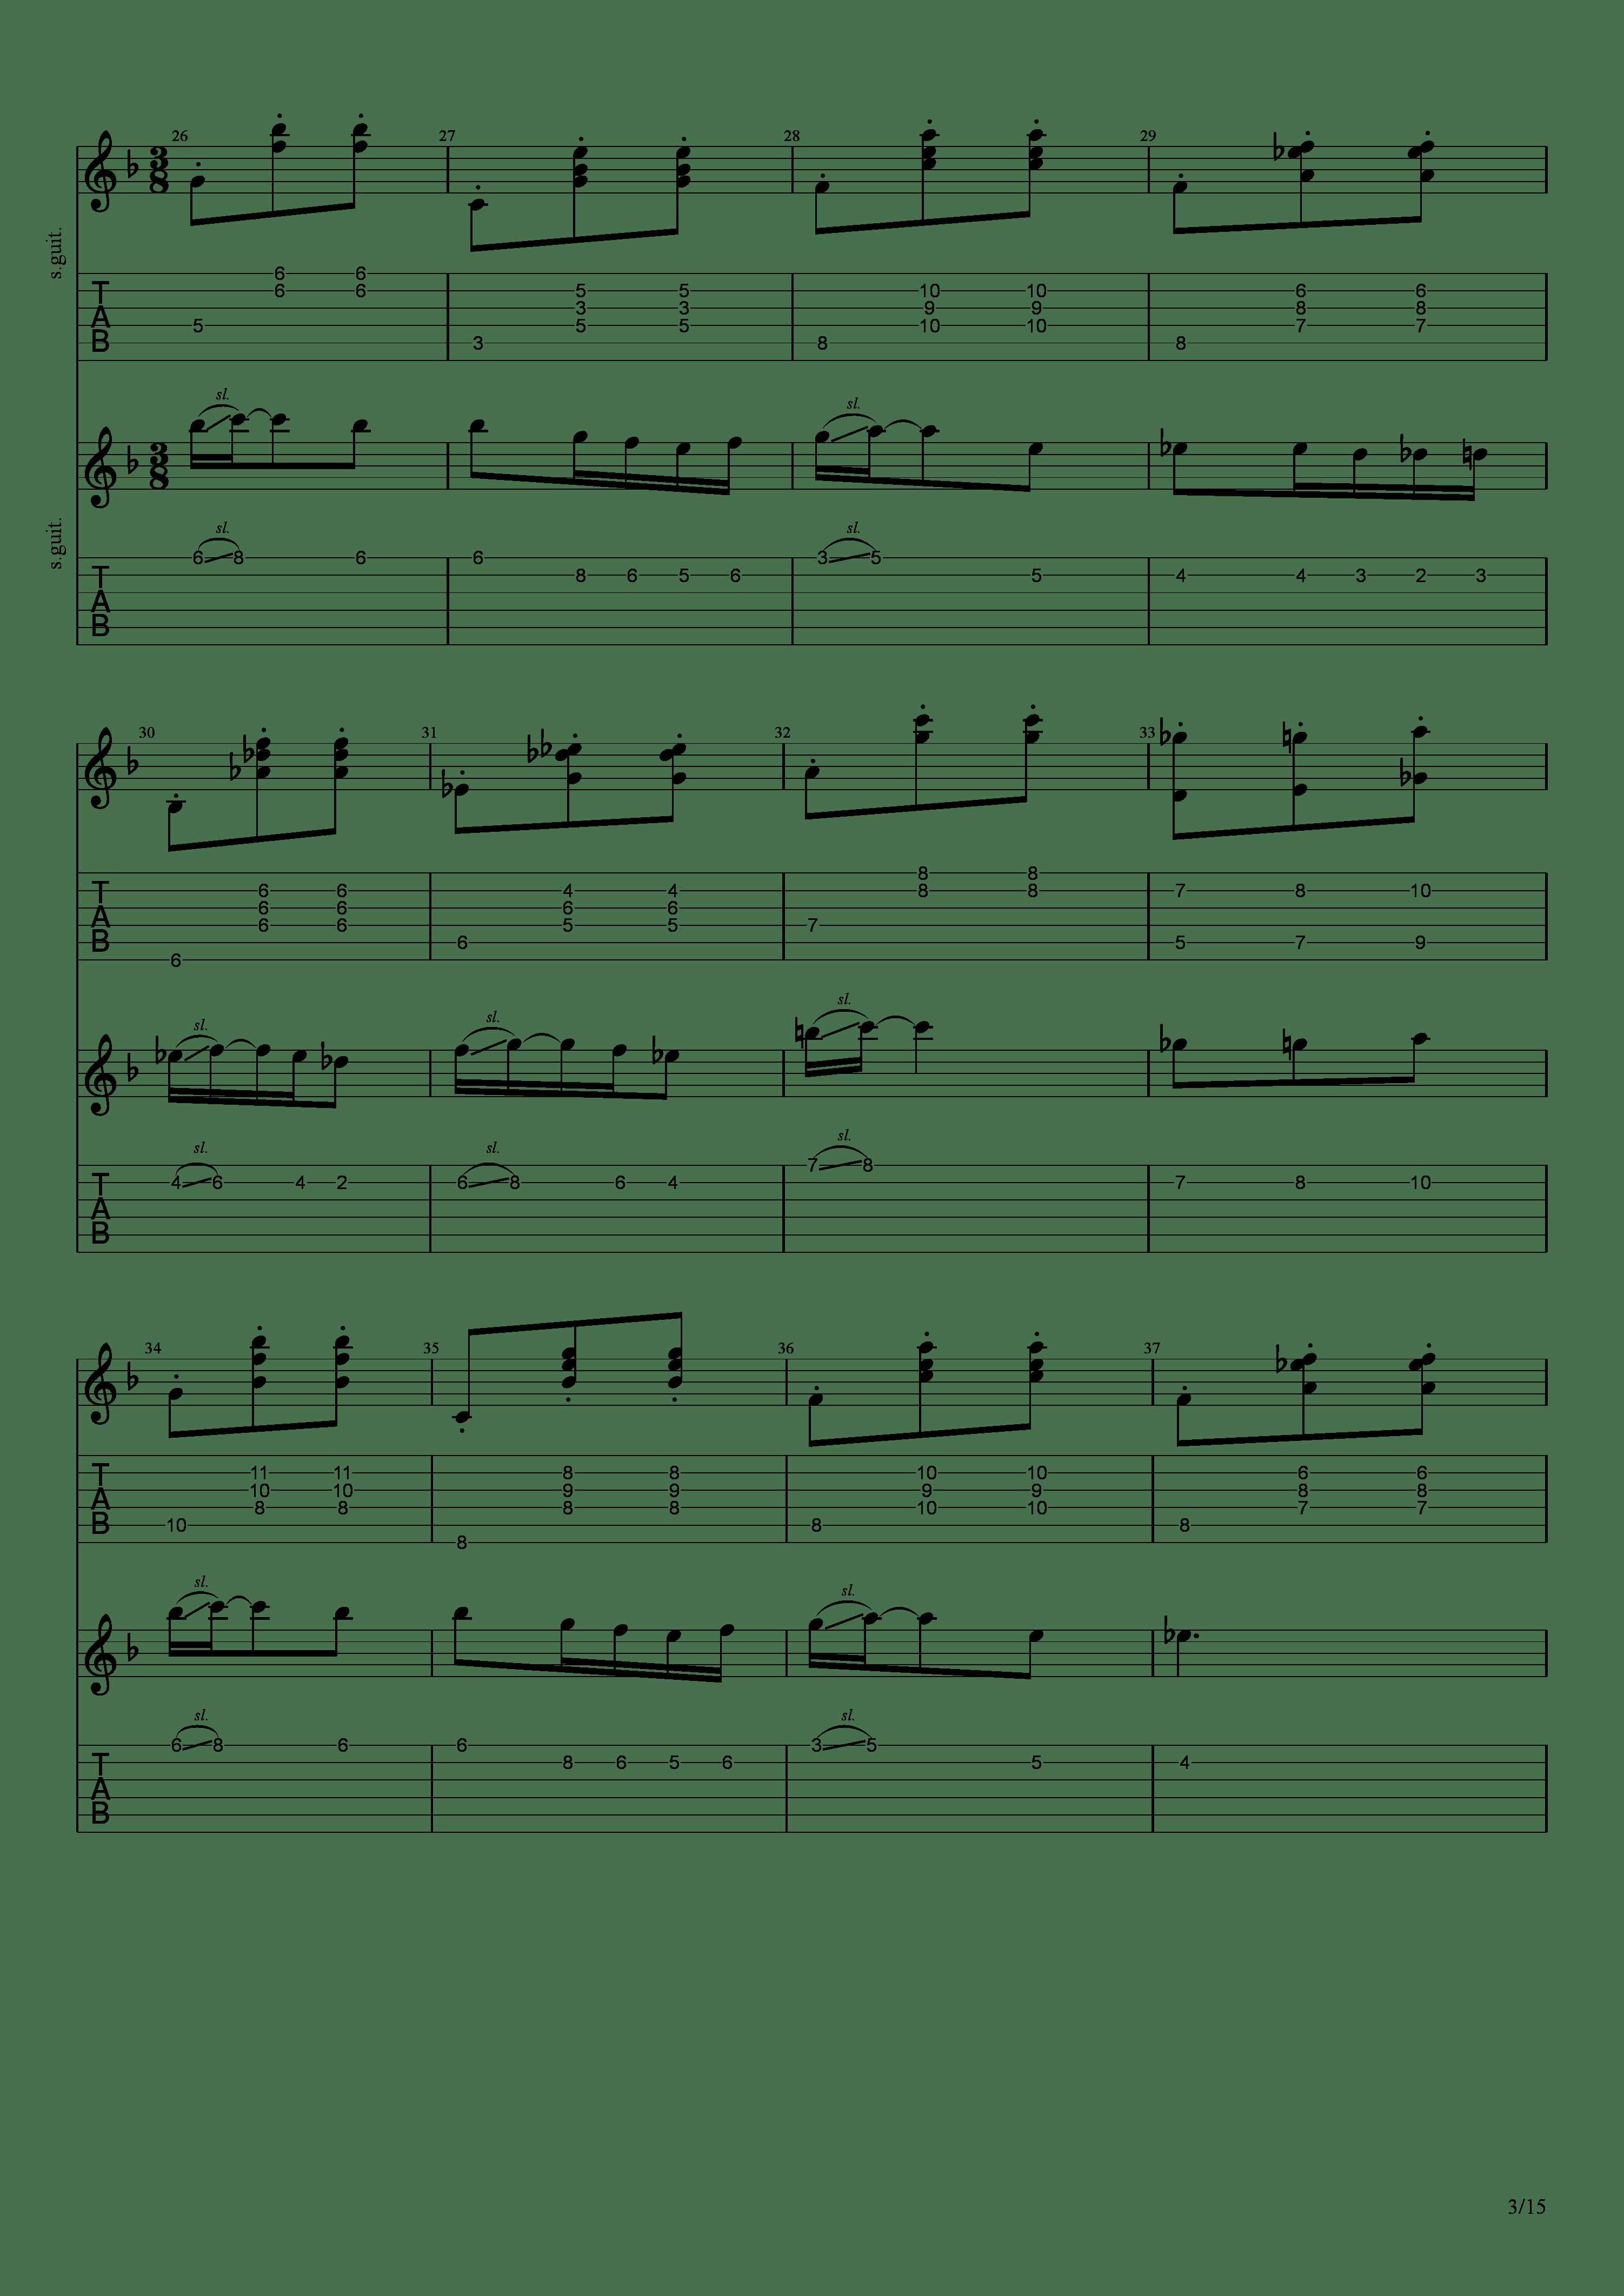 Labyrinth (松井佑贵&井草圣二)吉他谱3